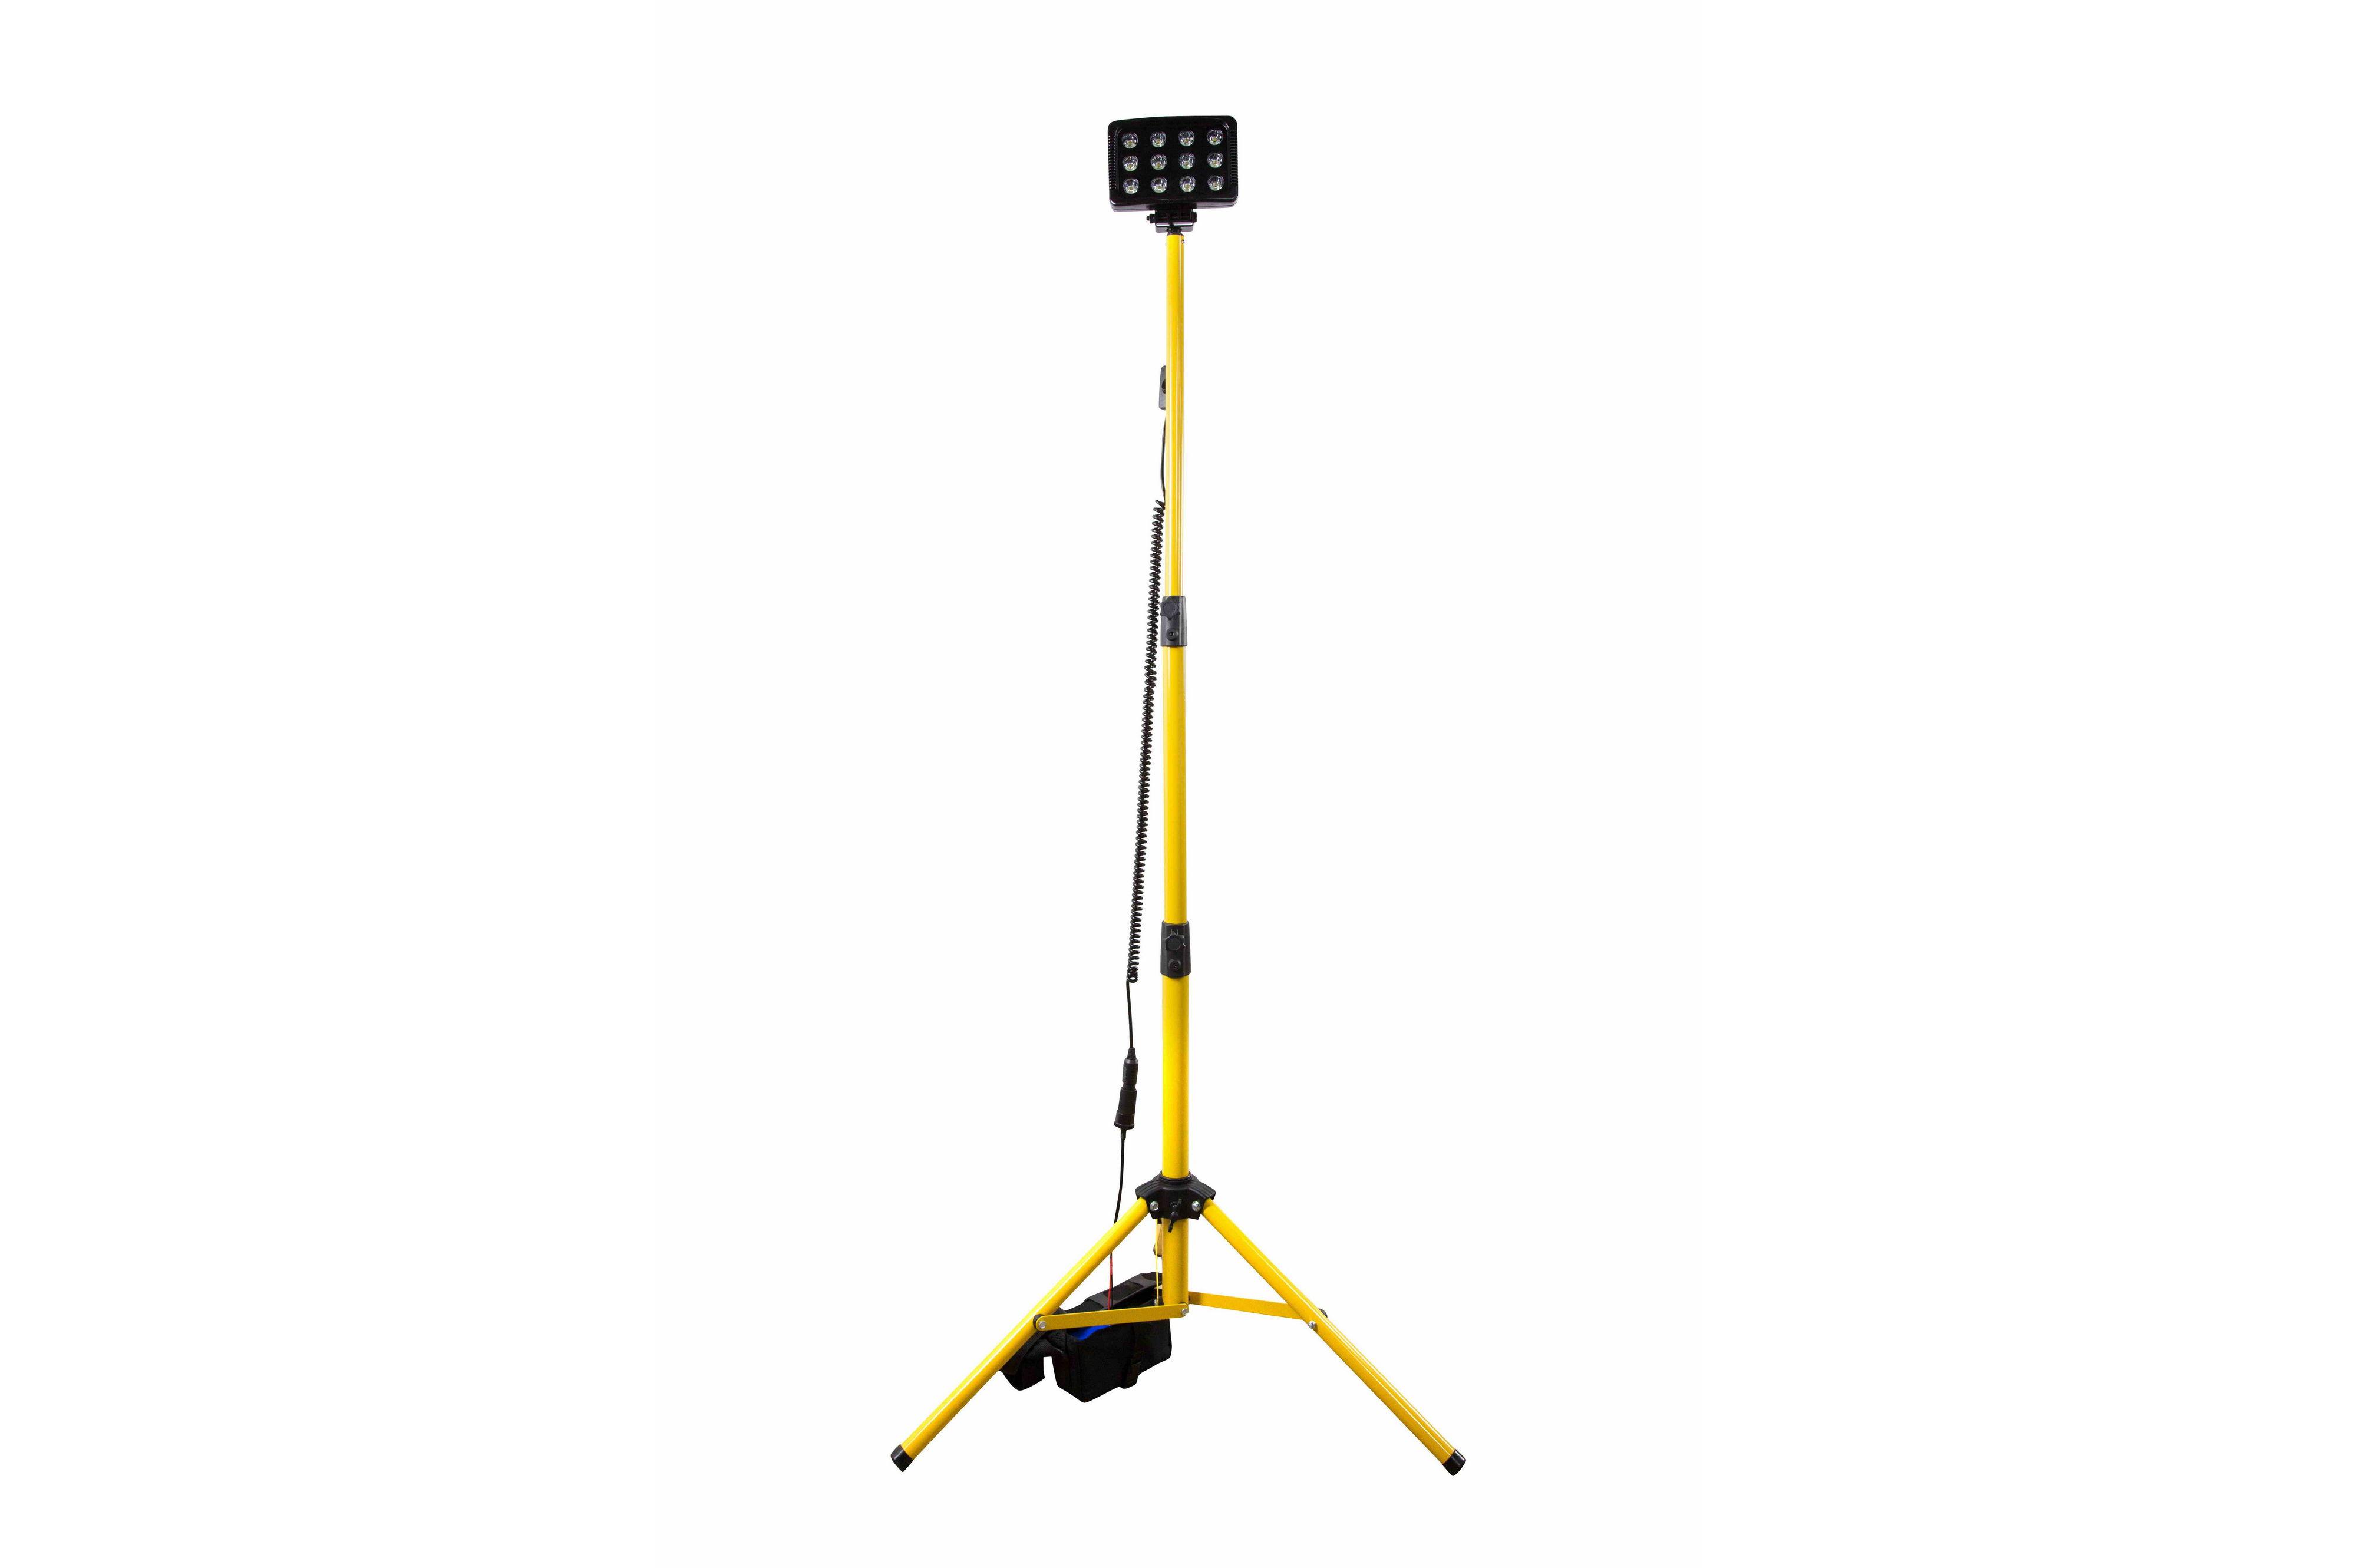 36 Watt Portable Rechargeable Led Tripod Lighting System